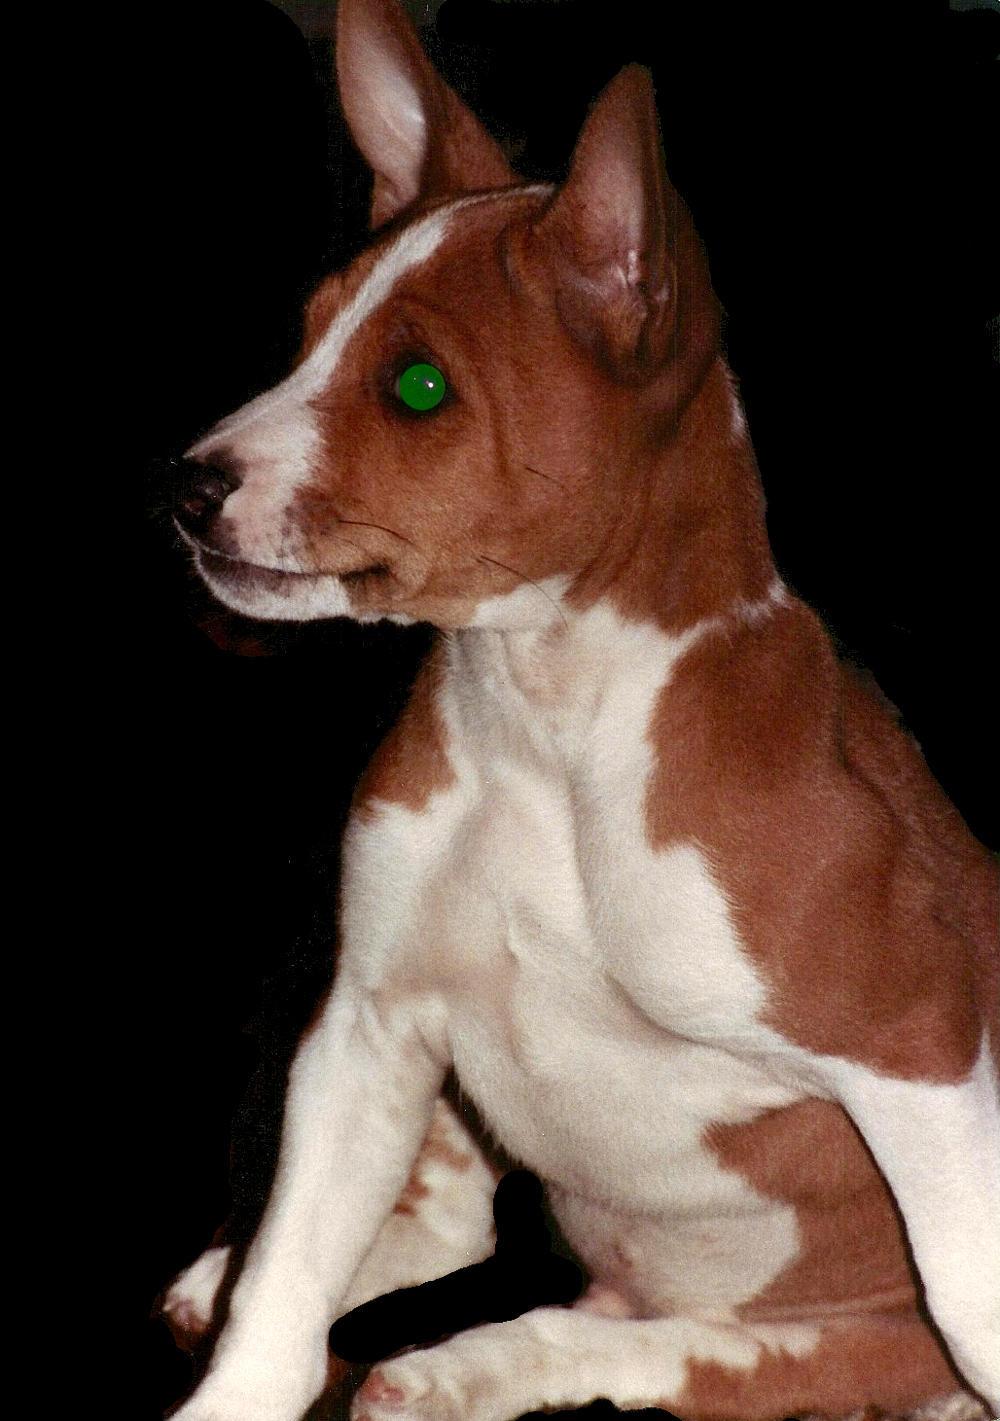 INFriend Crleiu - a replipup with glowing green eyes.